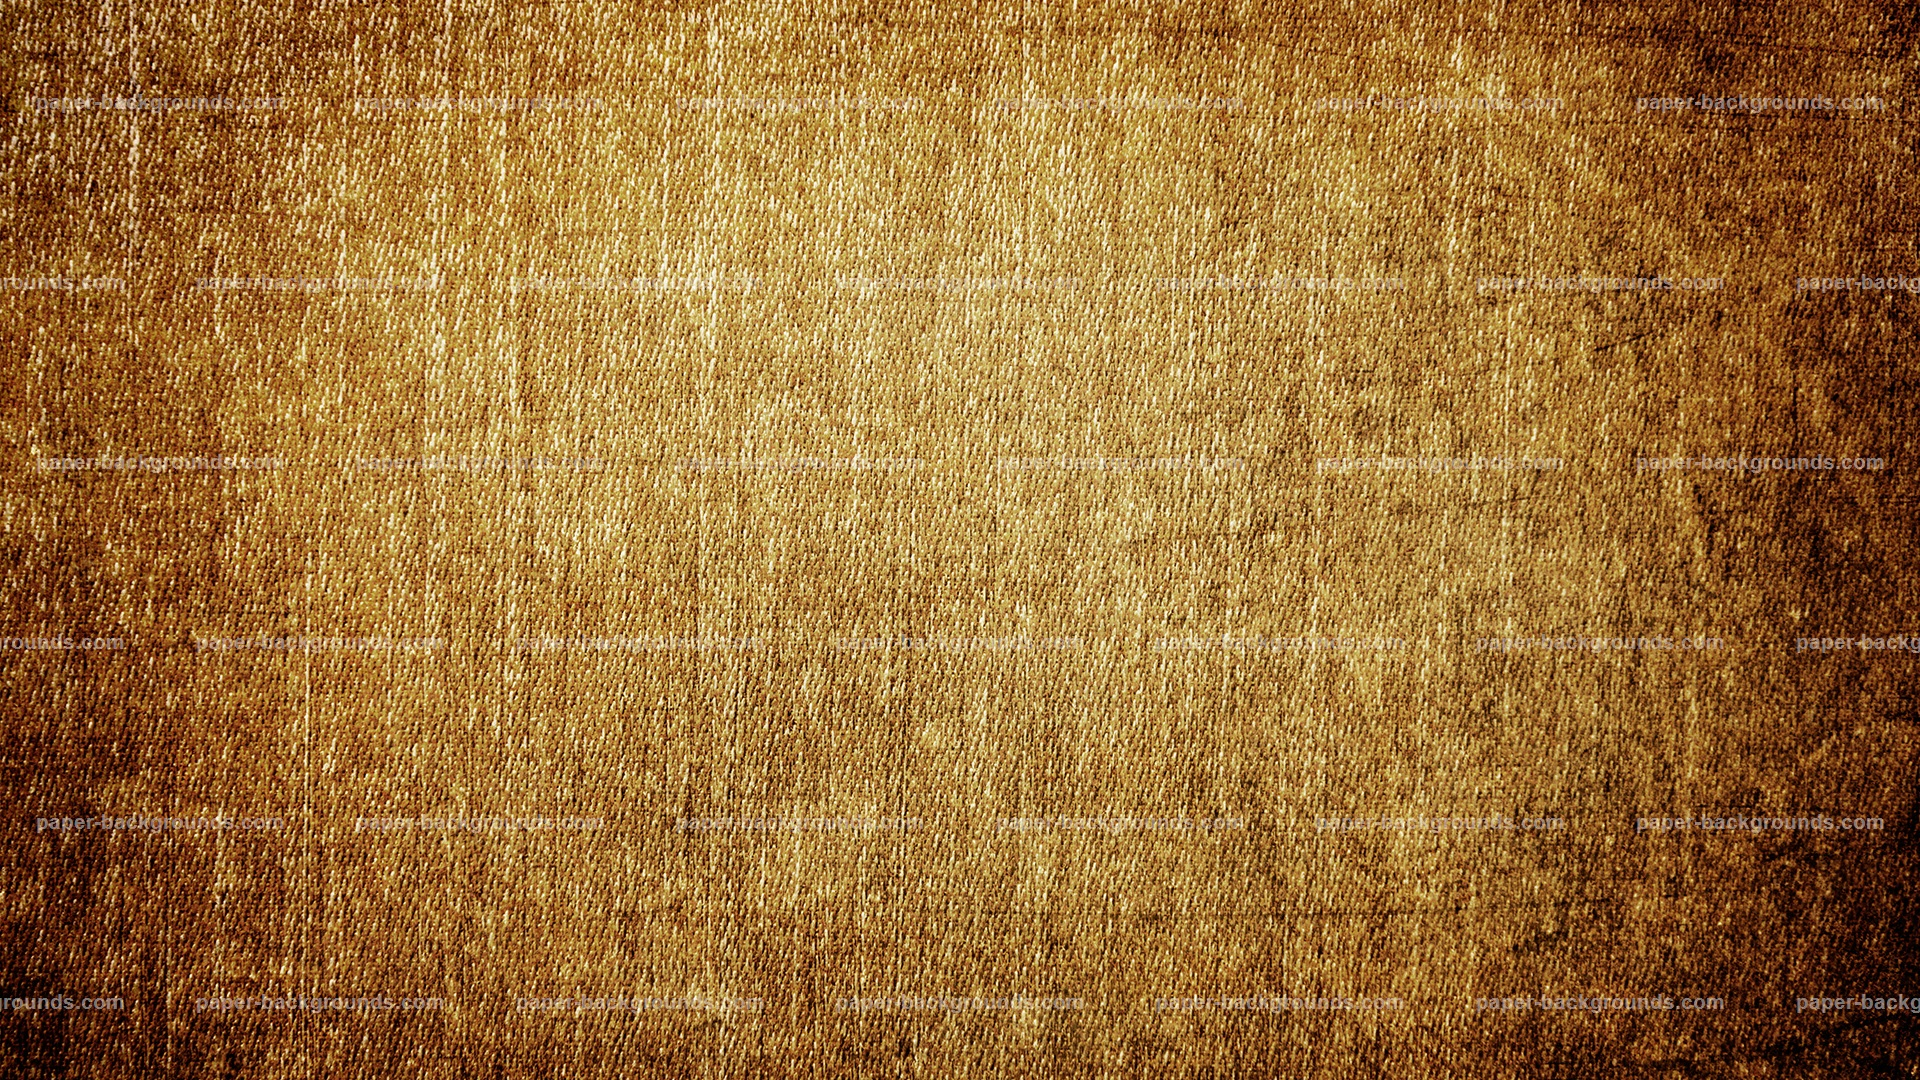 Hd Texture Backgrounds Wallpapersafari